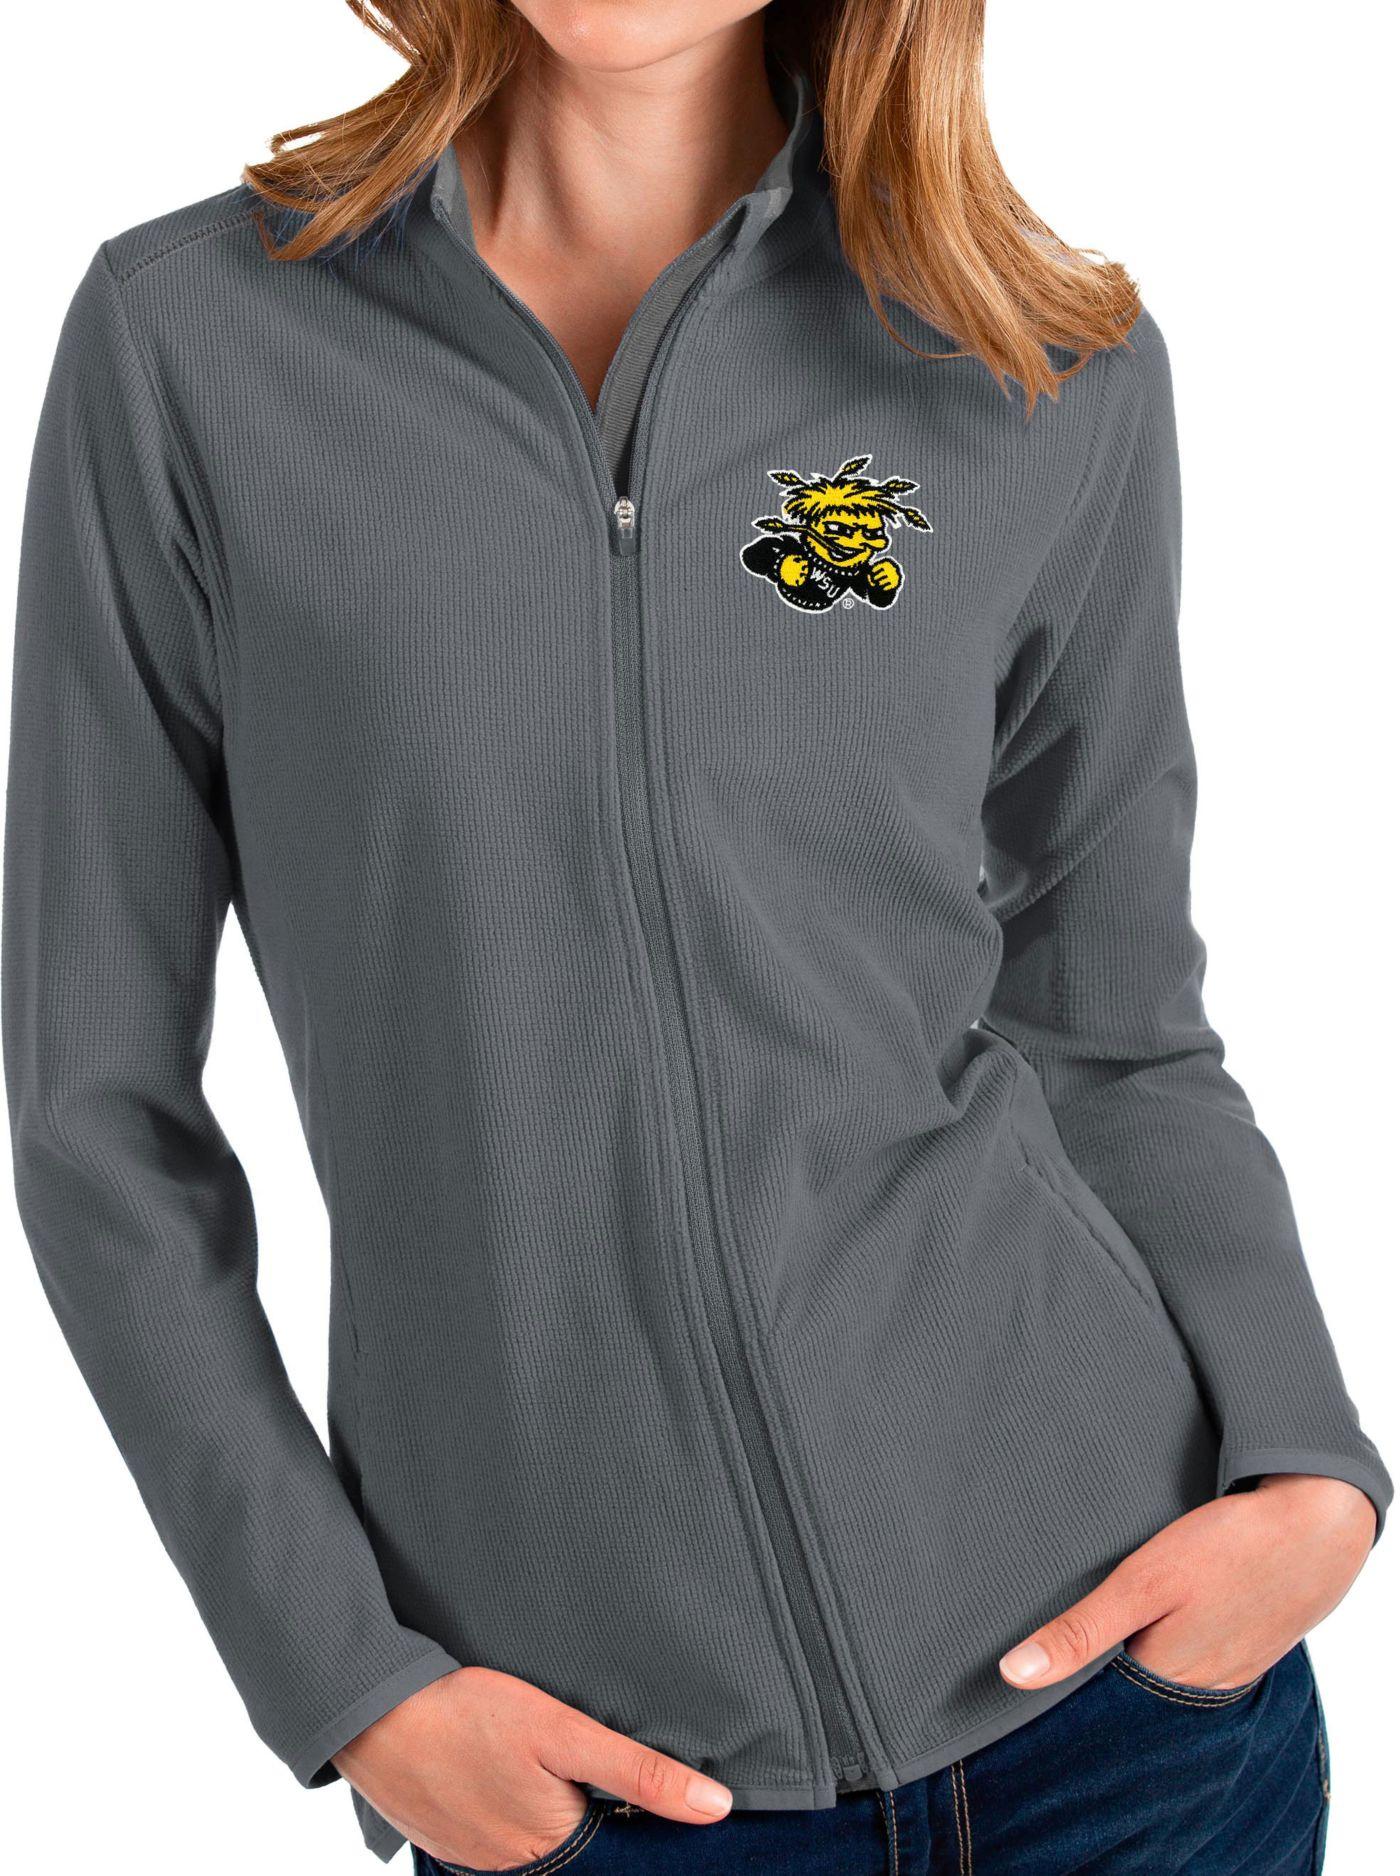 Antigua Women's Wichita State Shockers Grey Glacier Full-Zip Jacket